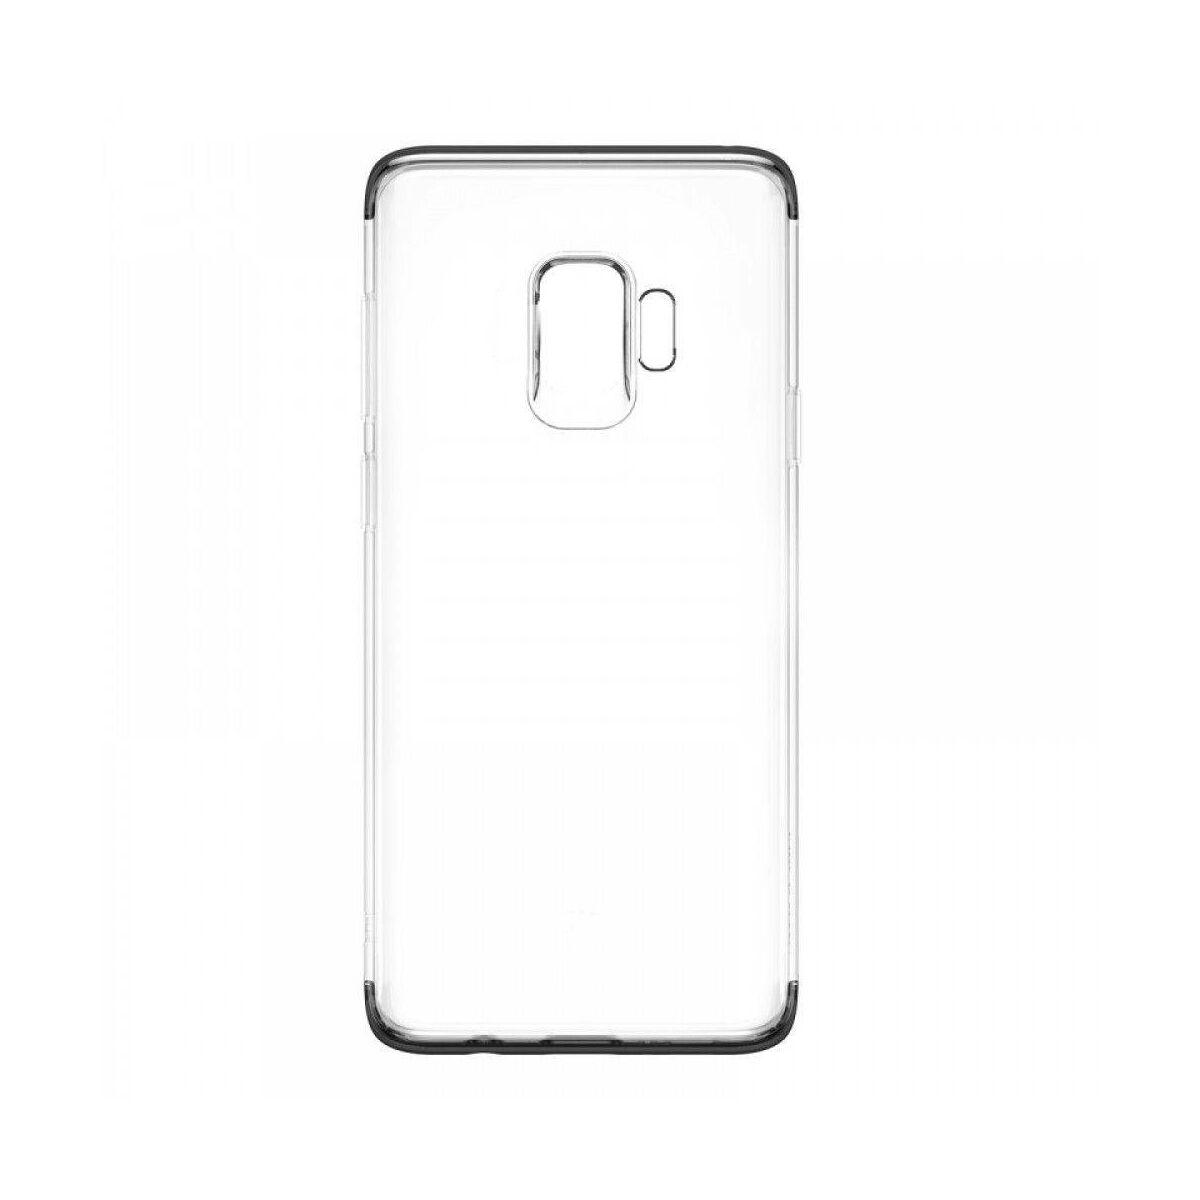 Baseus Samsung S9 tok, Armor, fekete (WISAS9-YJ01)